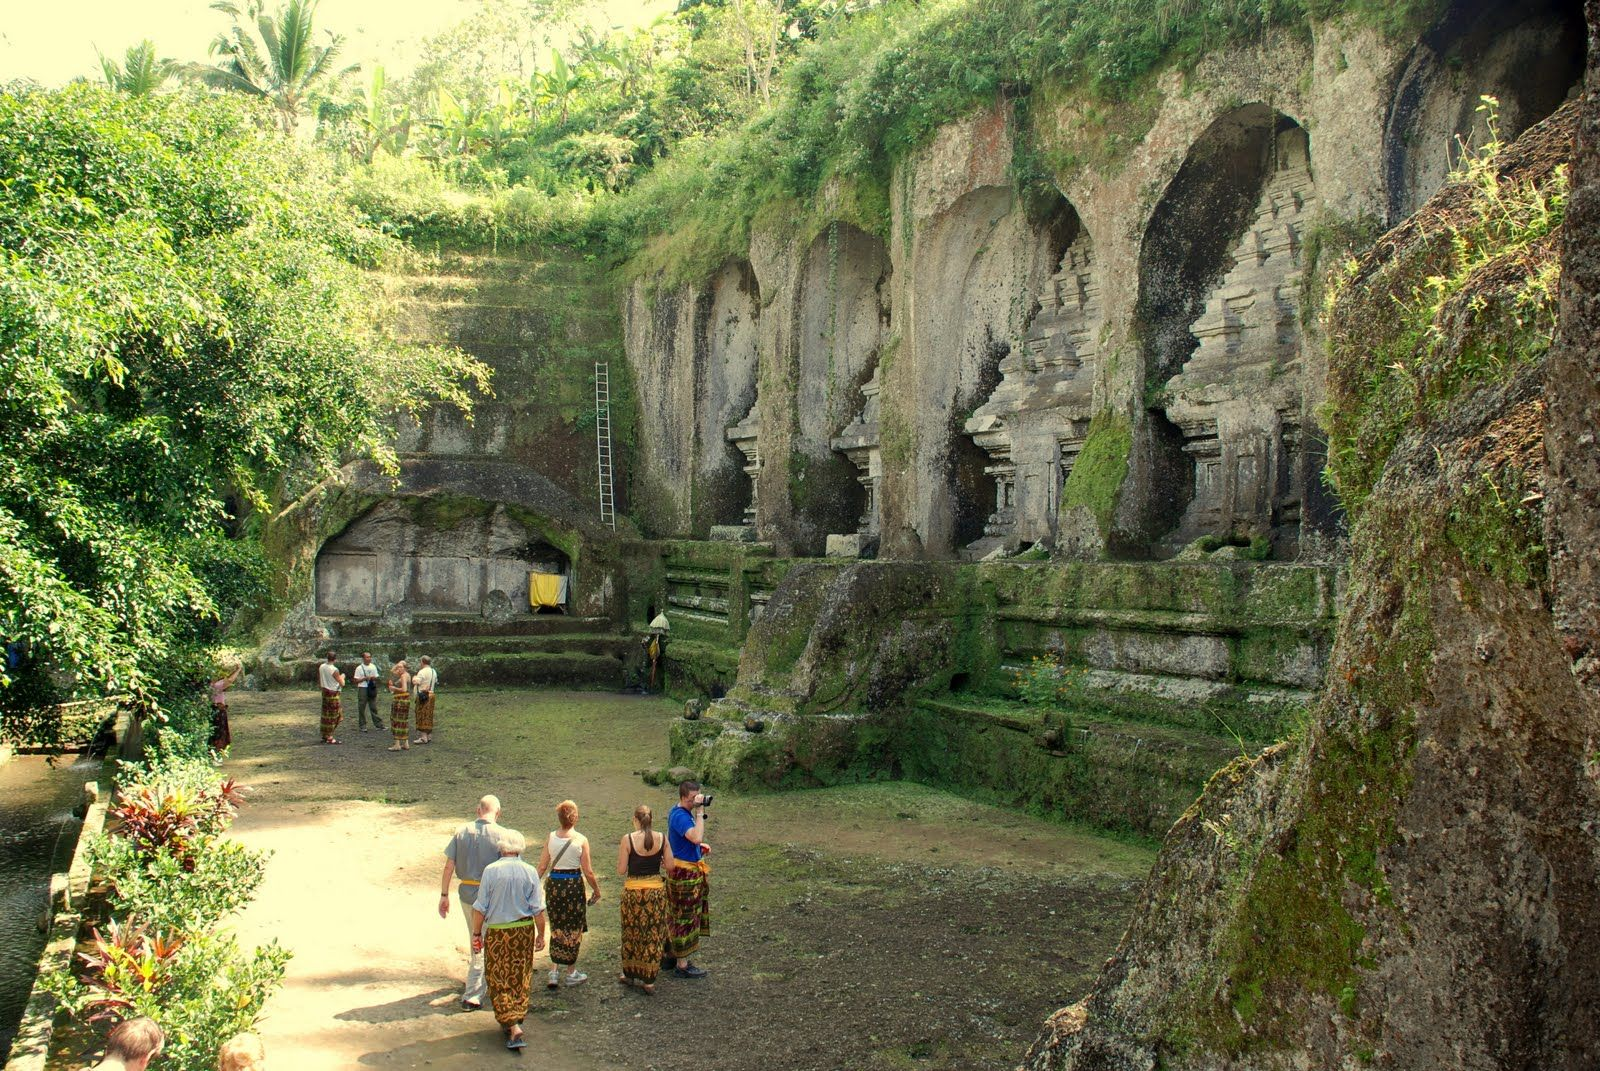 Bali Kintamani Tour And Barong Dance With Japanese Speaking